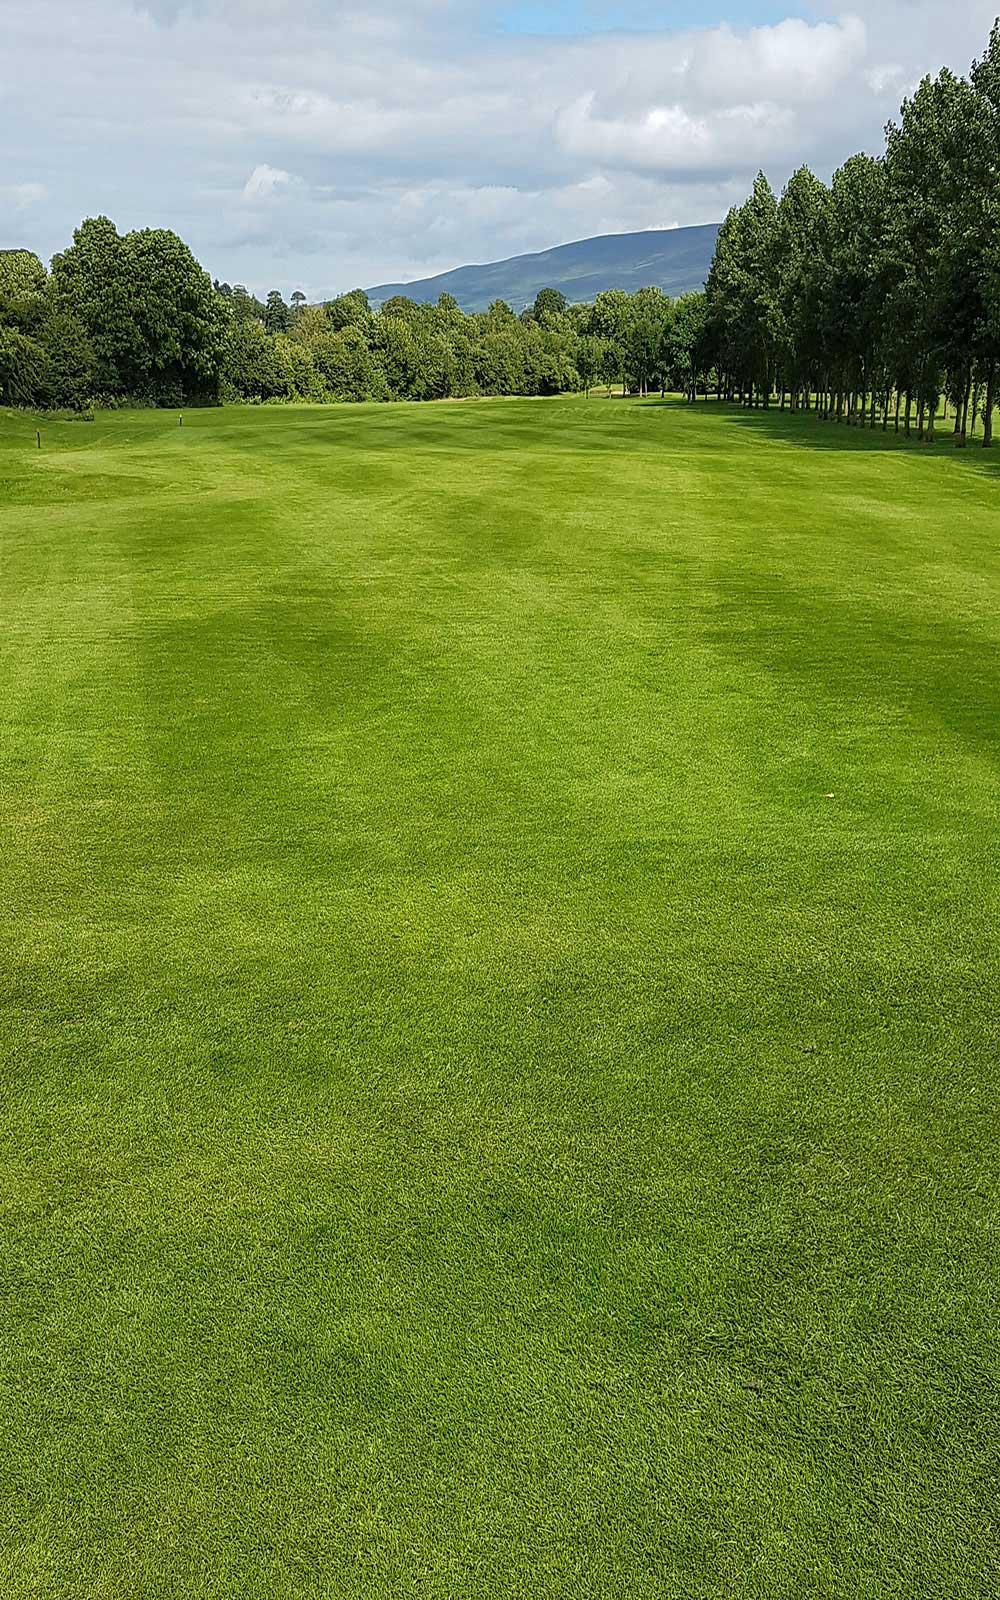 Slievenamon Golf Club 7th Fairway